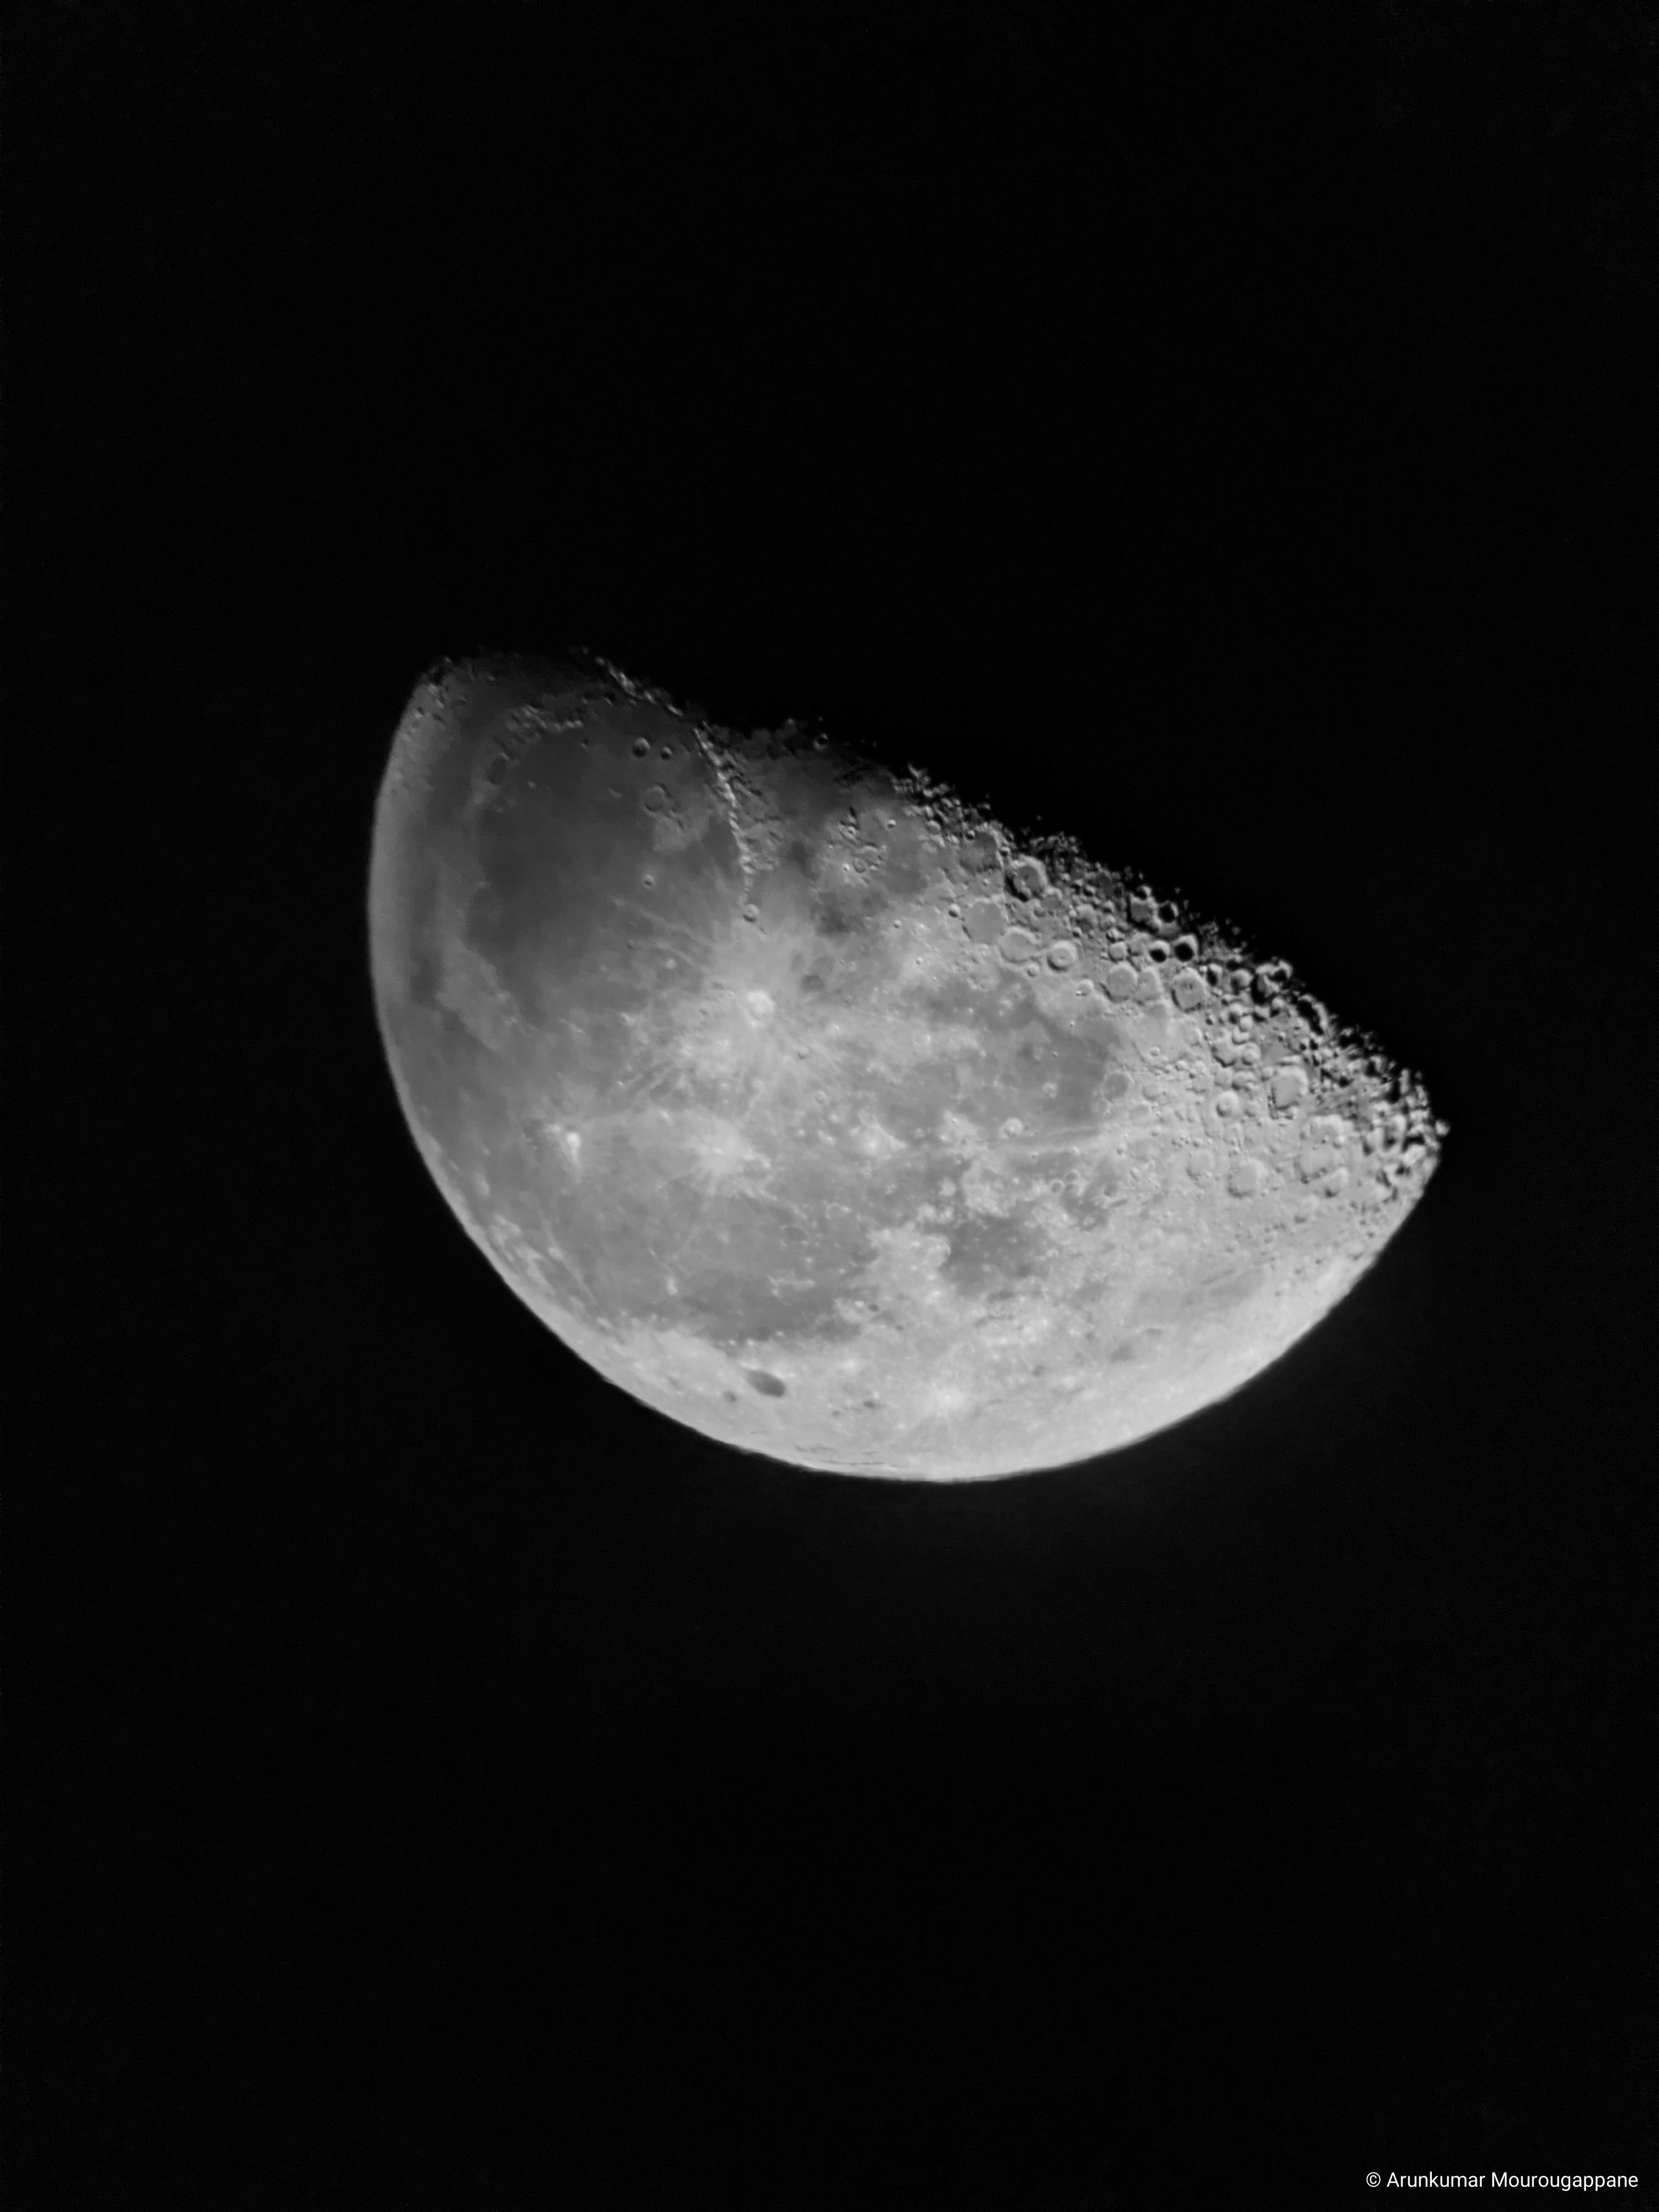 Arunkumar Mourougappane Lunar Photography